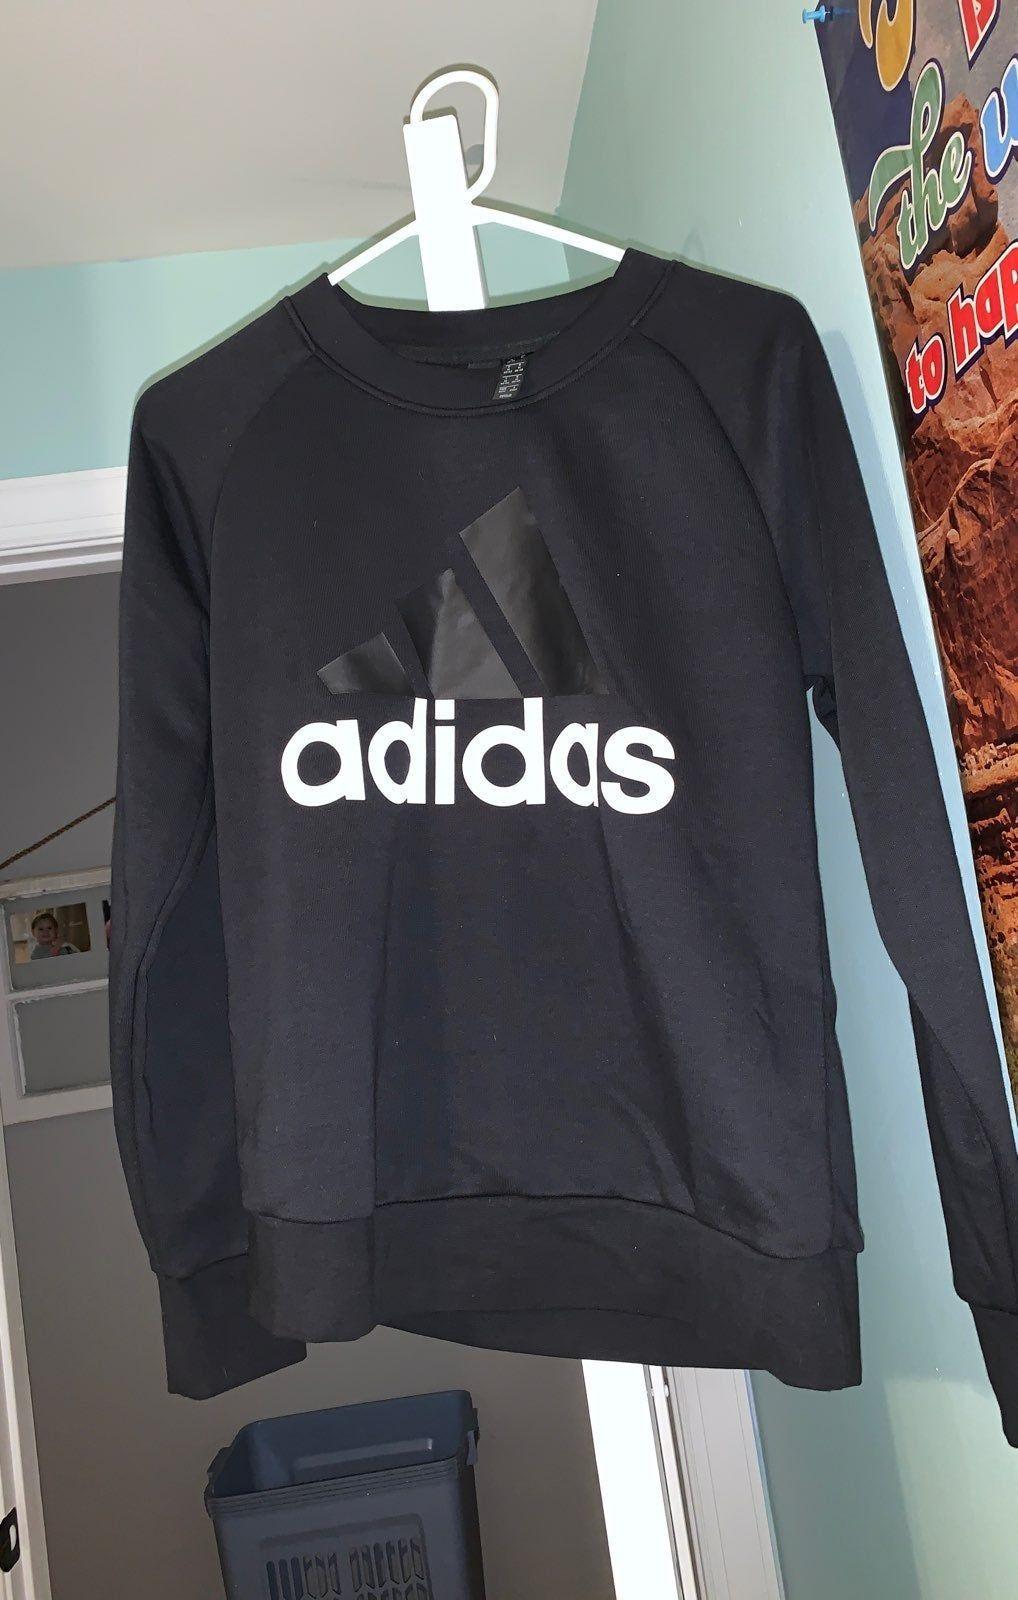 Hardly Any Wear Black Women S Medium Adidas Sweatshirt Wearing Black Sweatshirts [ 1600 x 1018 Pixel ]